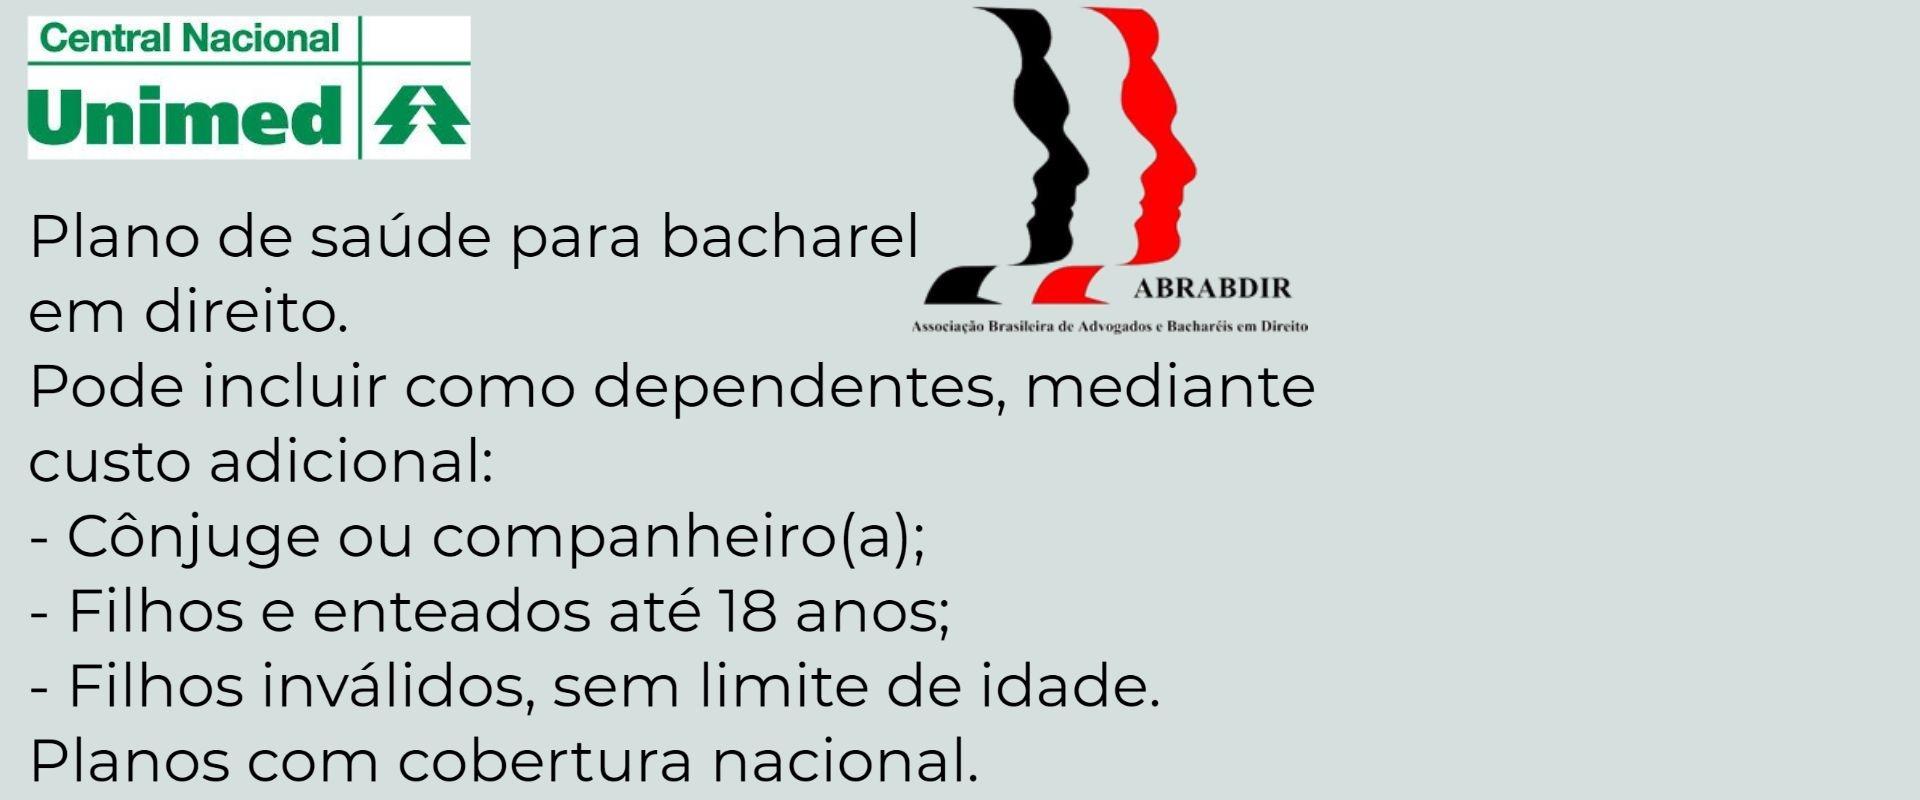 Unimed ABRABDIR Araraquara